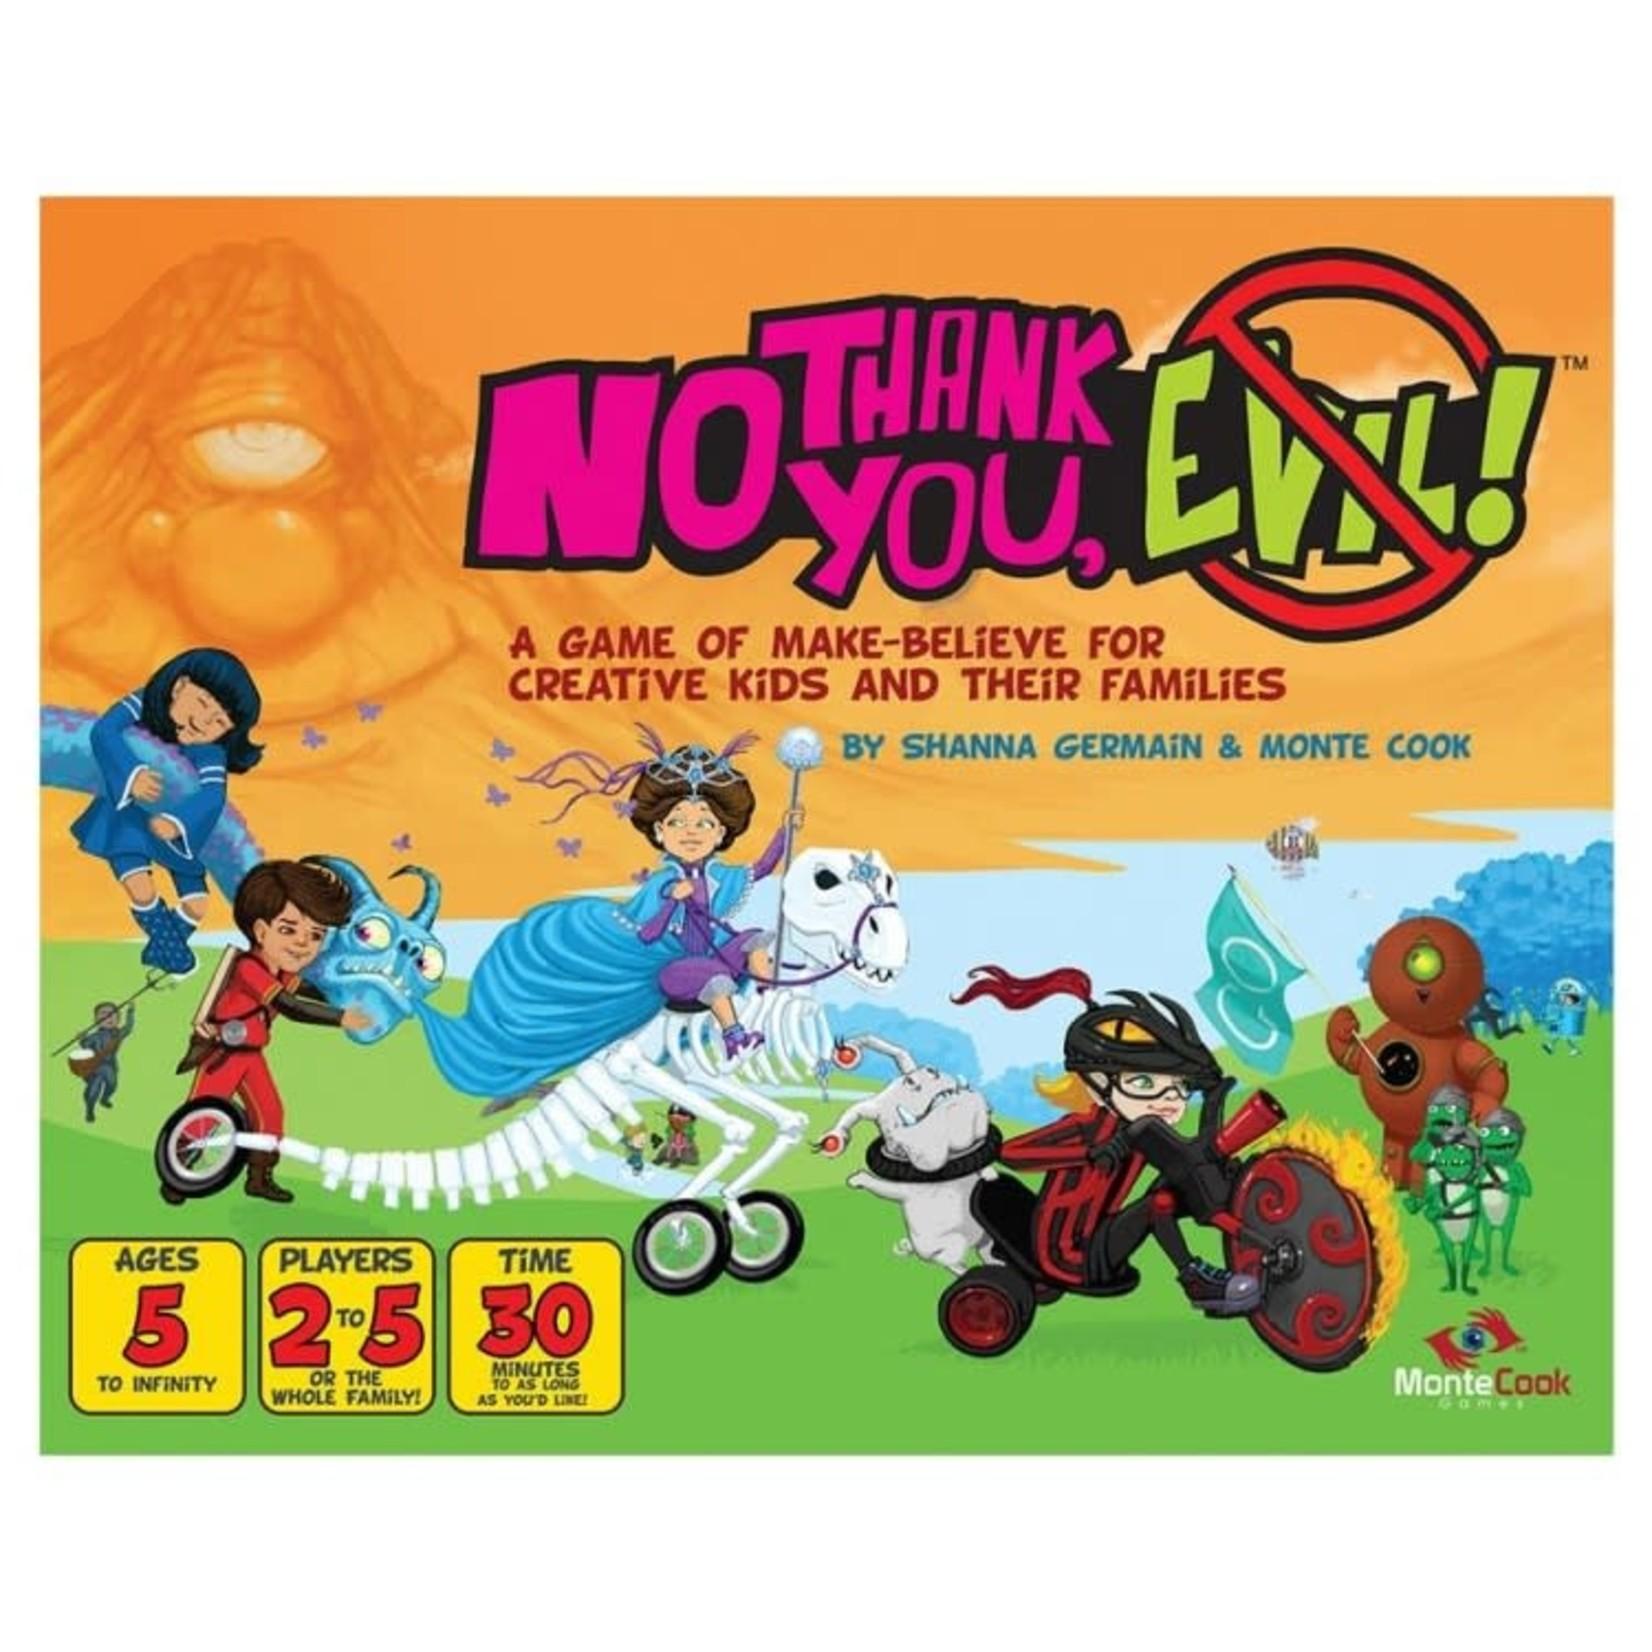 Monte Cook Games No Thank You, Evil!